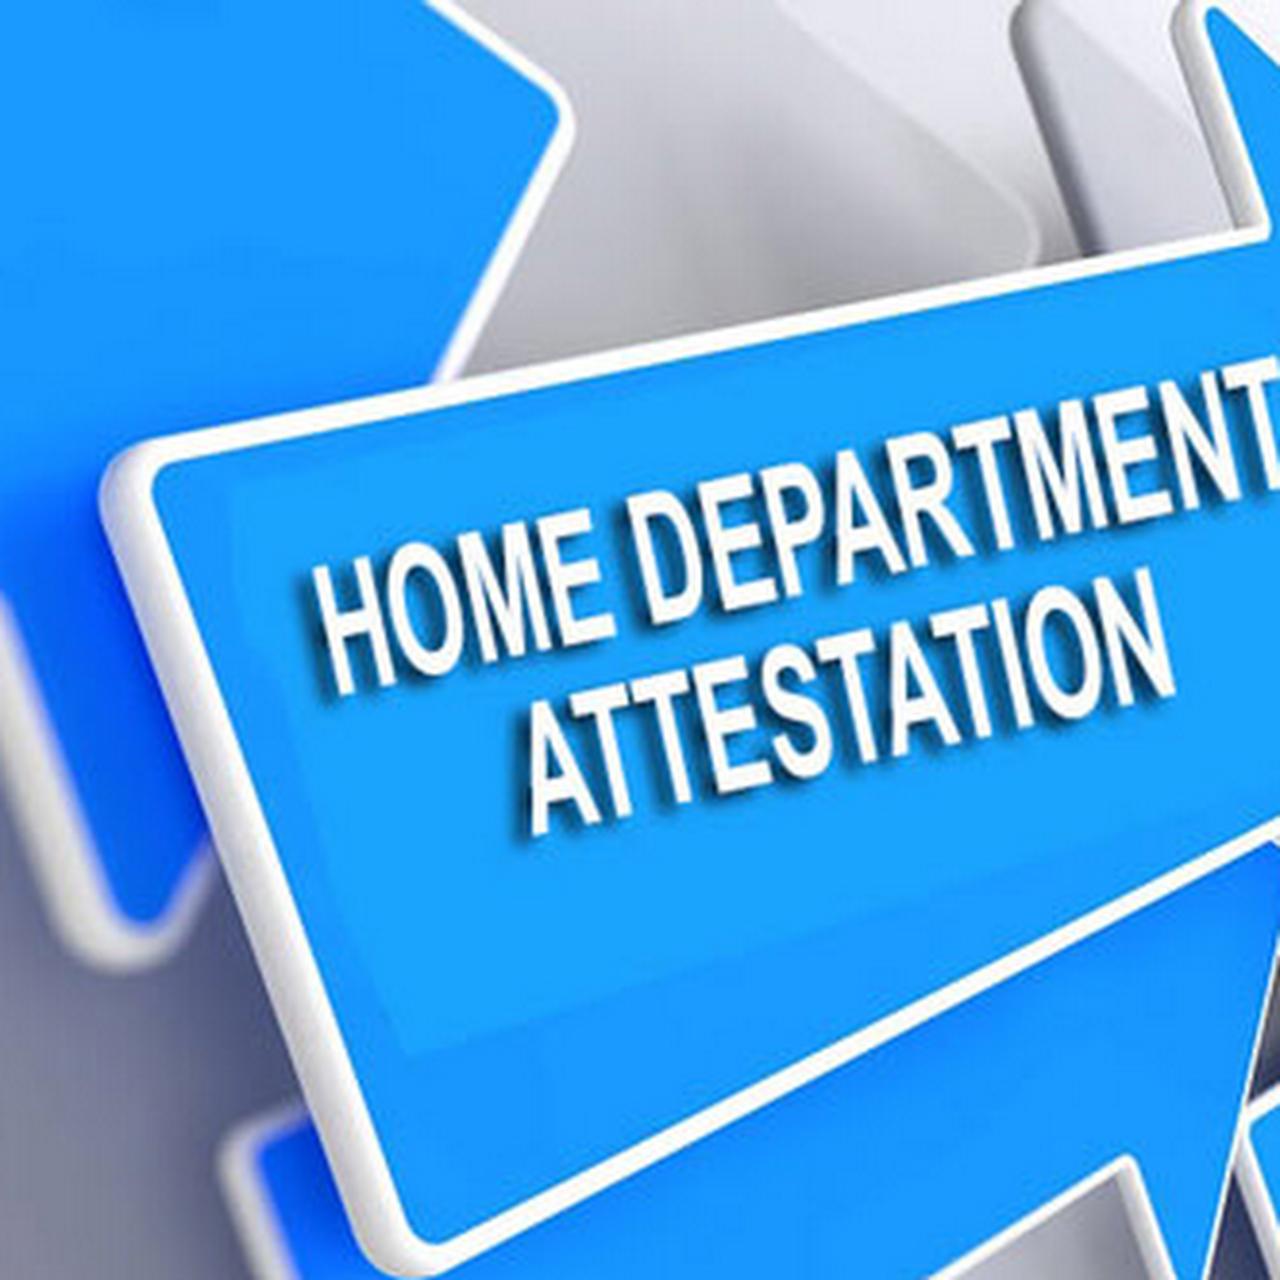 Speed Attestation services HRD, MEA, Apostille, Embassy